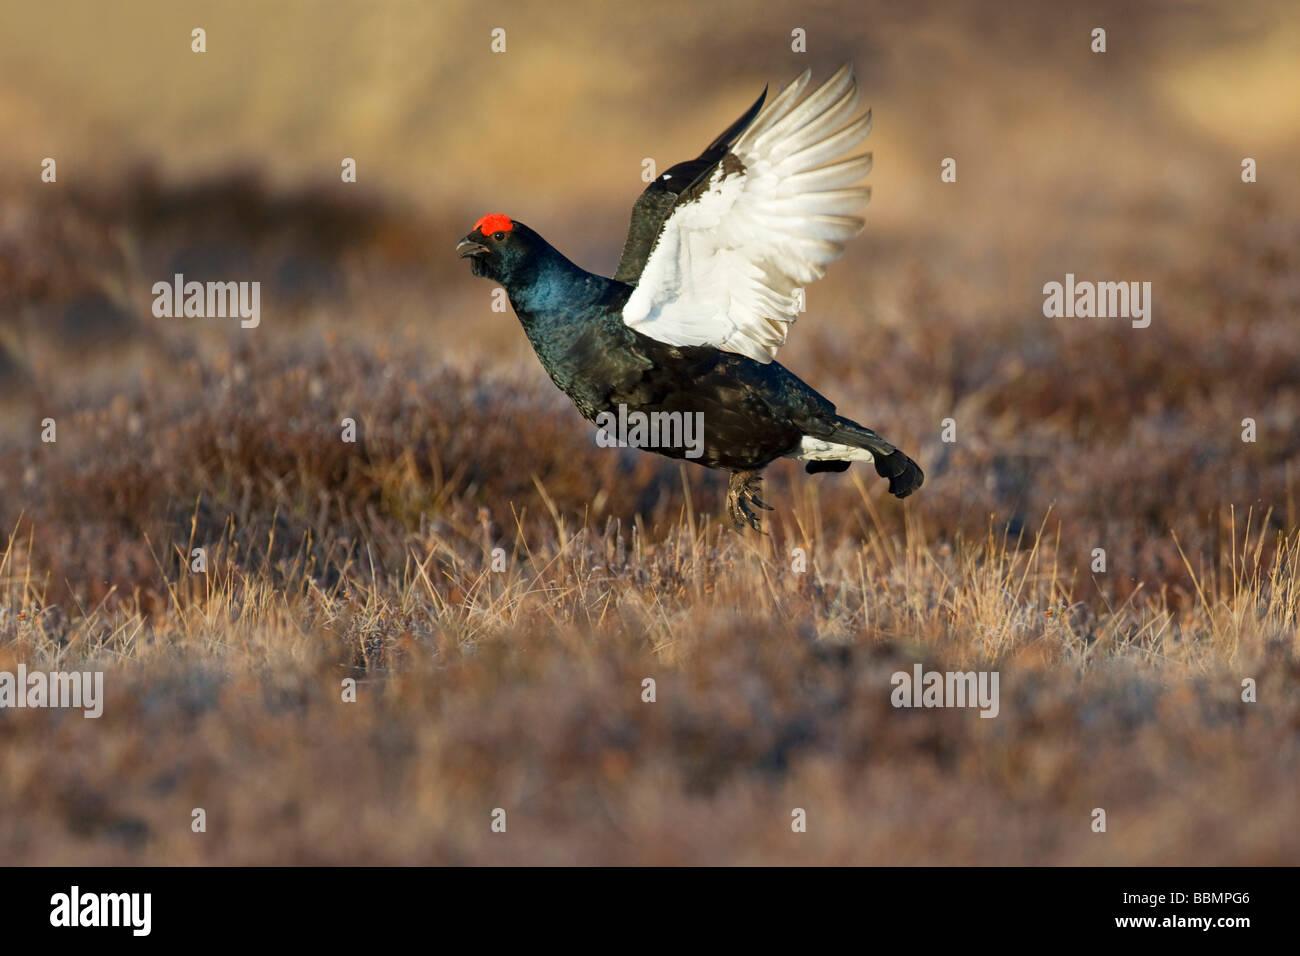 Black Grouse (Lyrurus tetrix), flying, Vaestergoetland, Sweden, Scandinavia, Europe - Stock Image